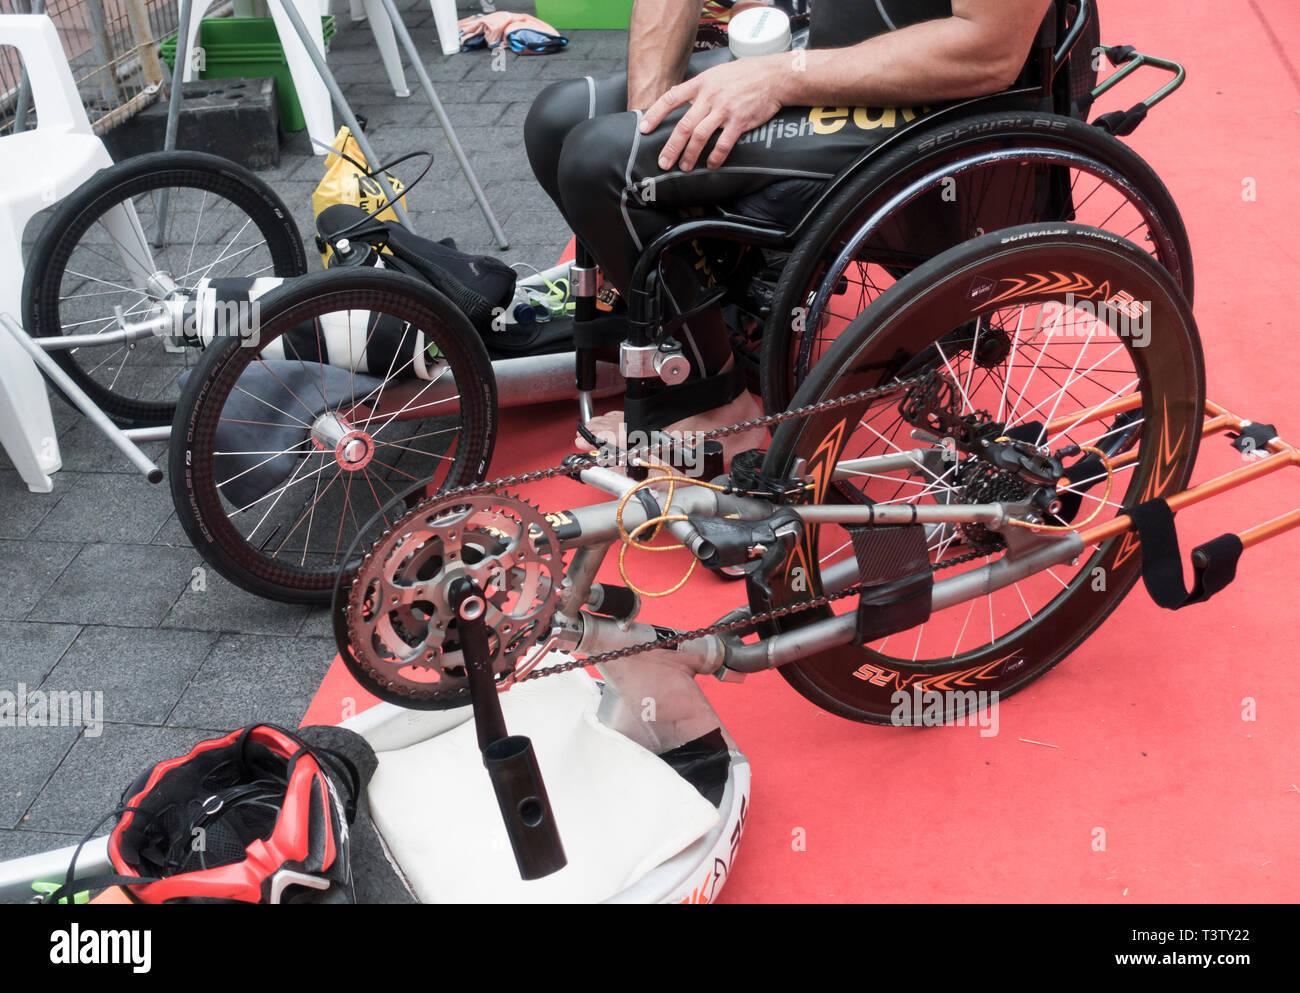 Disabled triathlete in transition area following swin leg of triathlon. - Stock Image